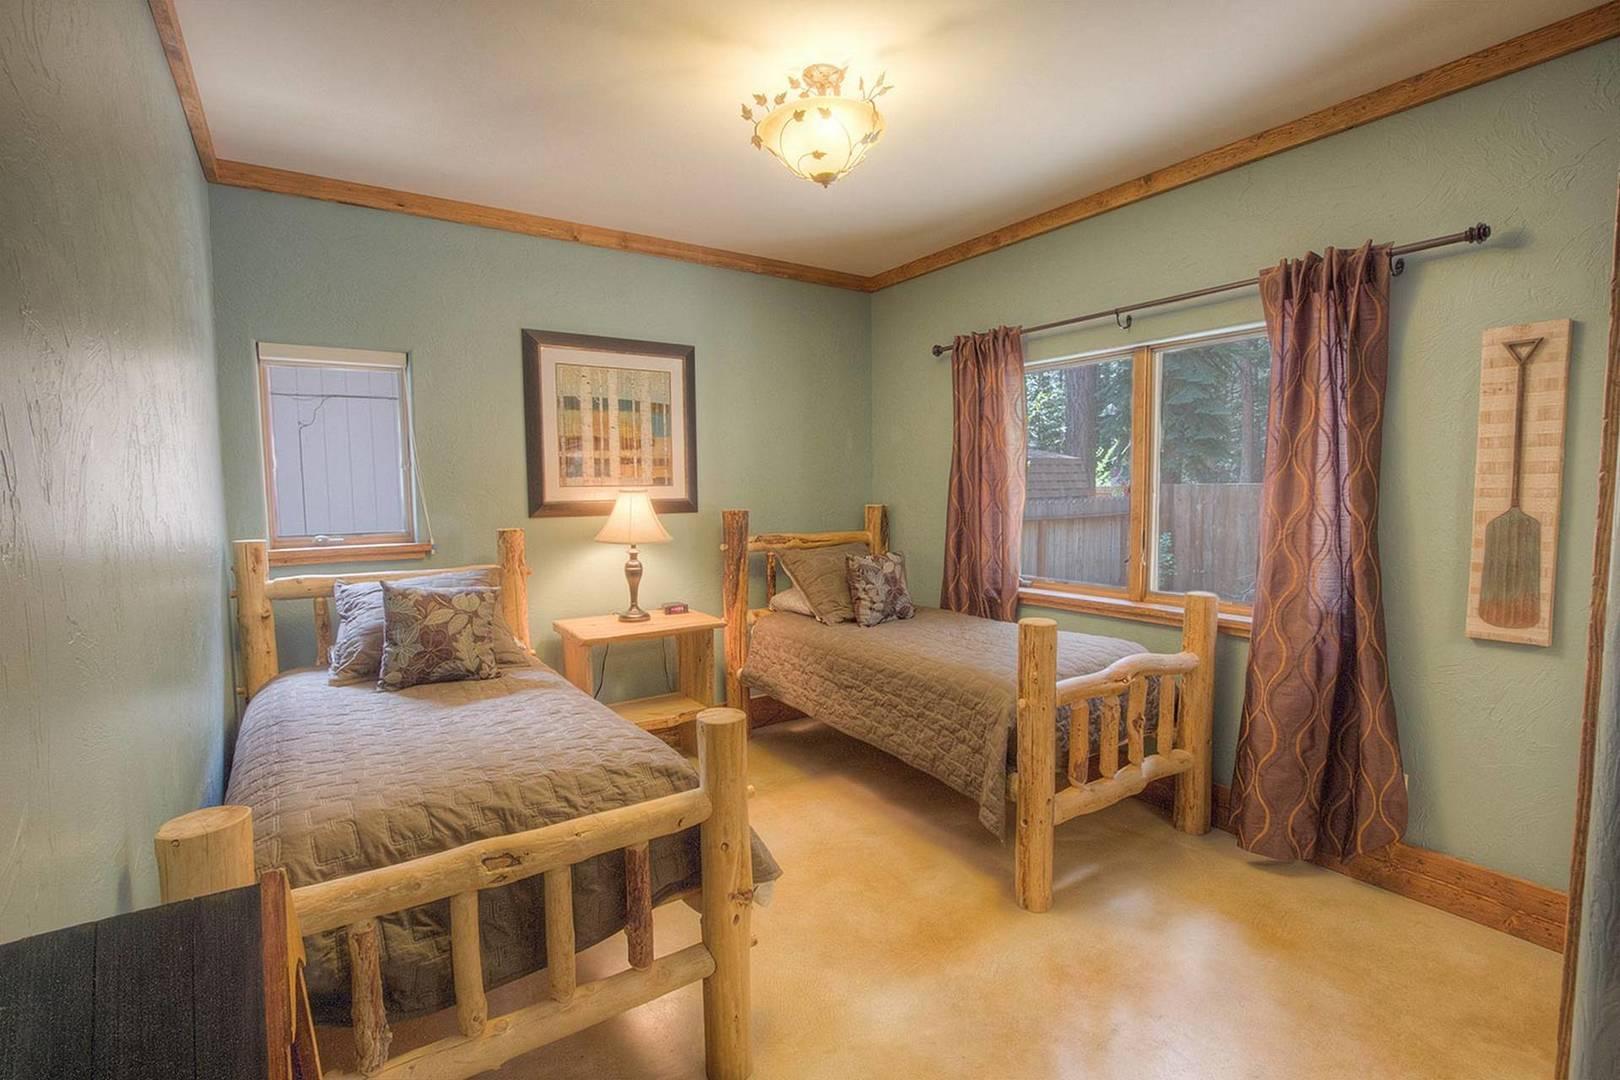 cyh1016 bedroom